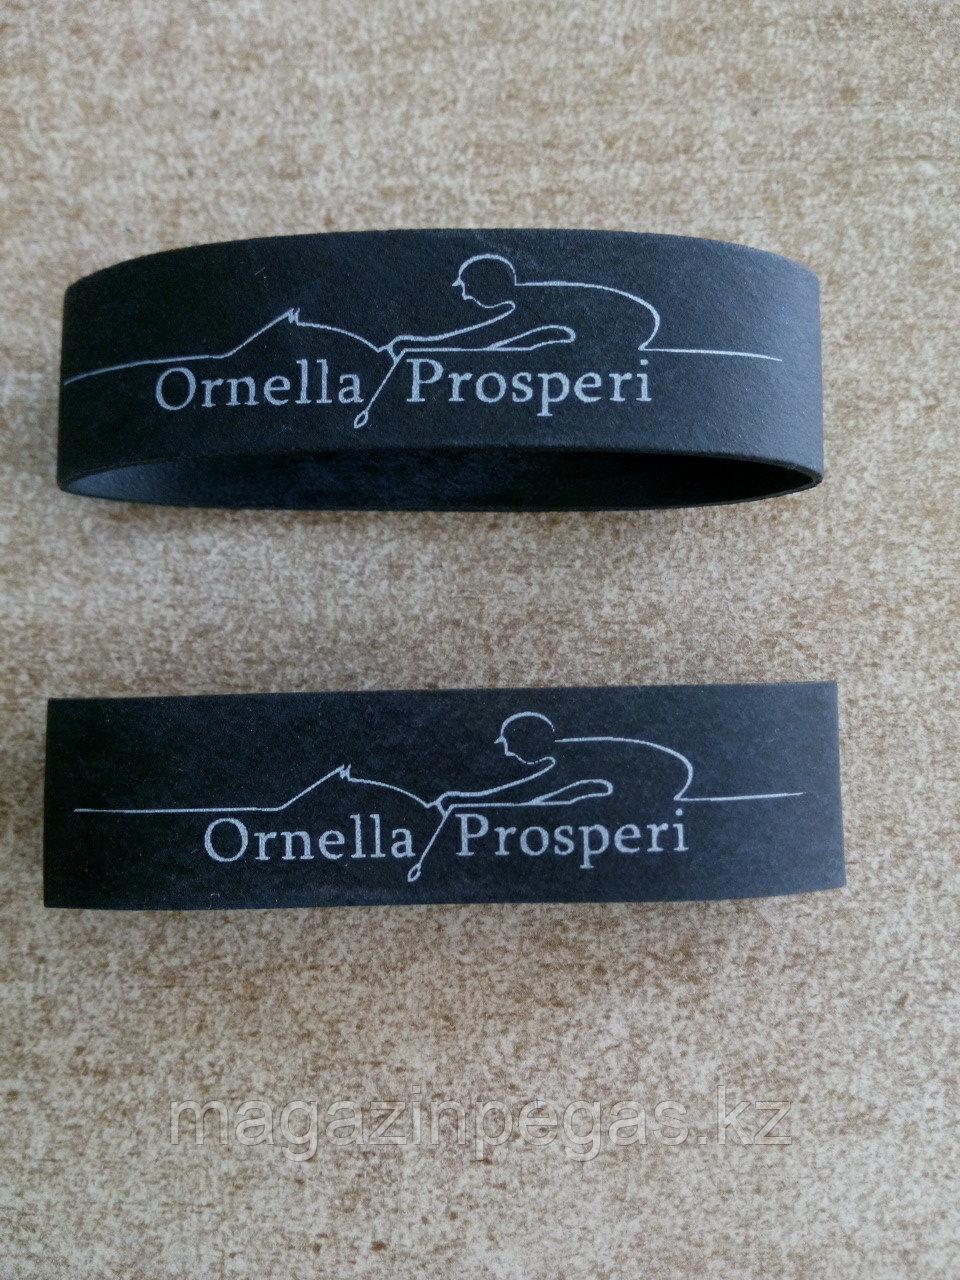 Резиновая лента для запястья Prosperi.